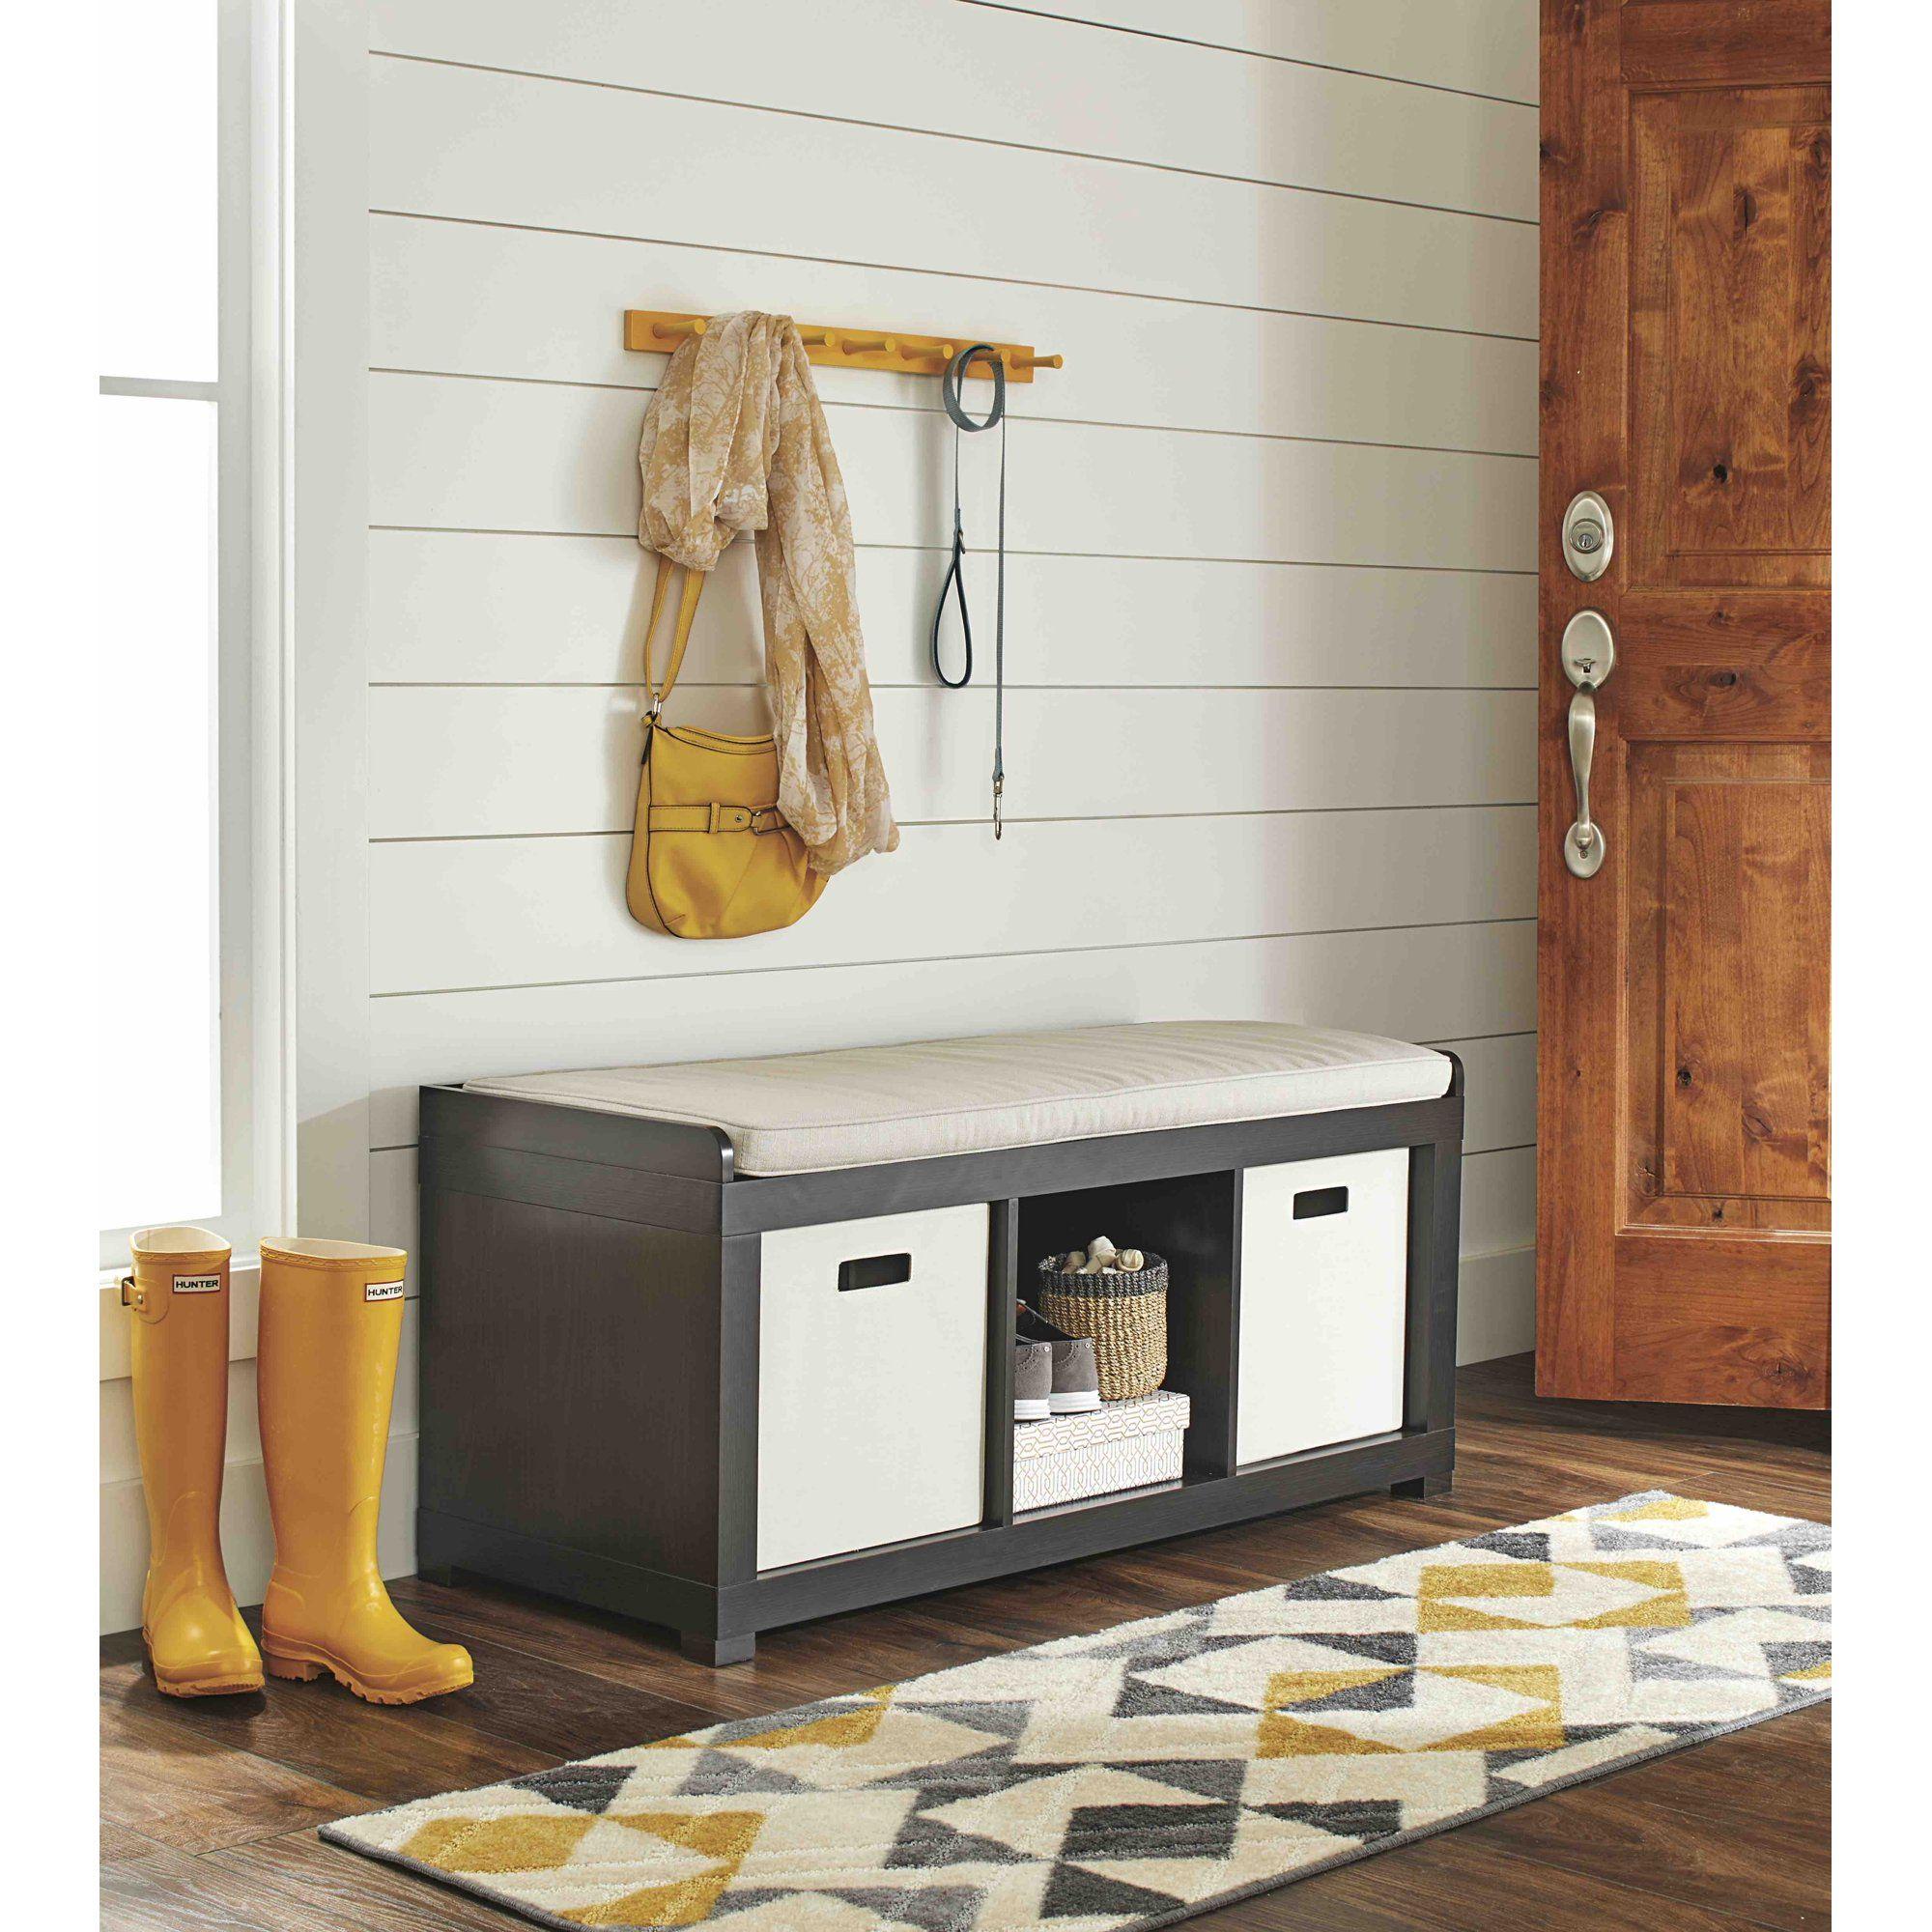 7146da2b3ed80098fc2d5988b20c980b - Better Homes And Gardens 3 Cube Organizer Bench With Cushion